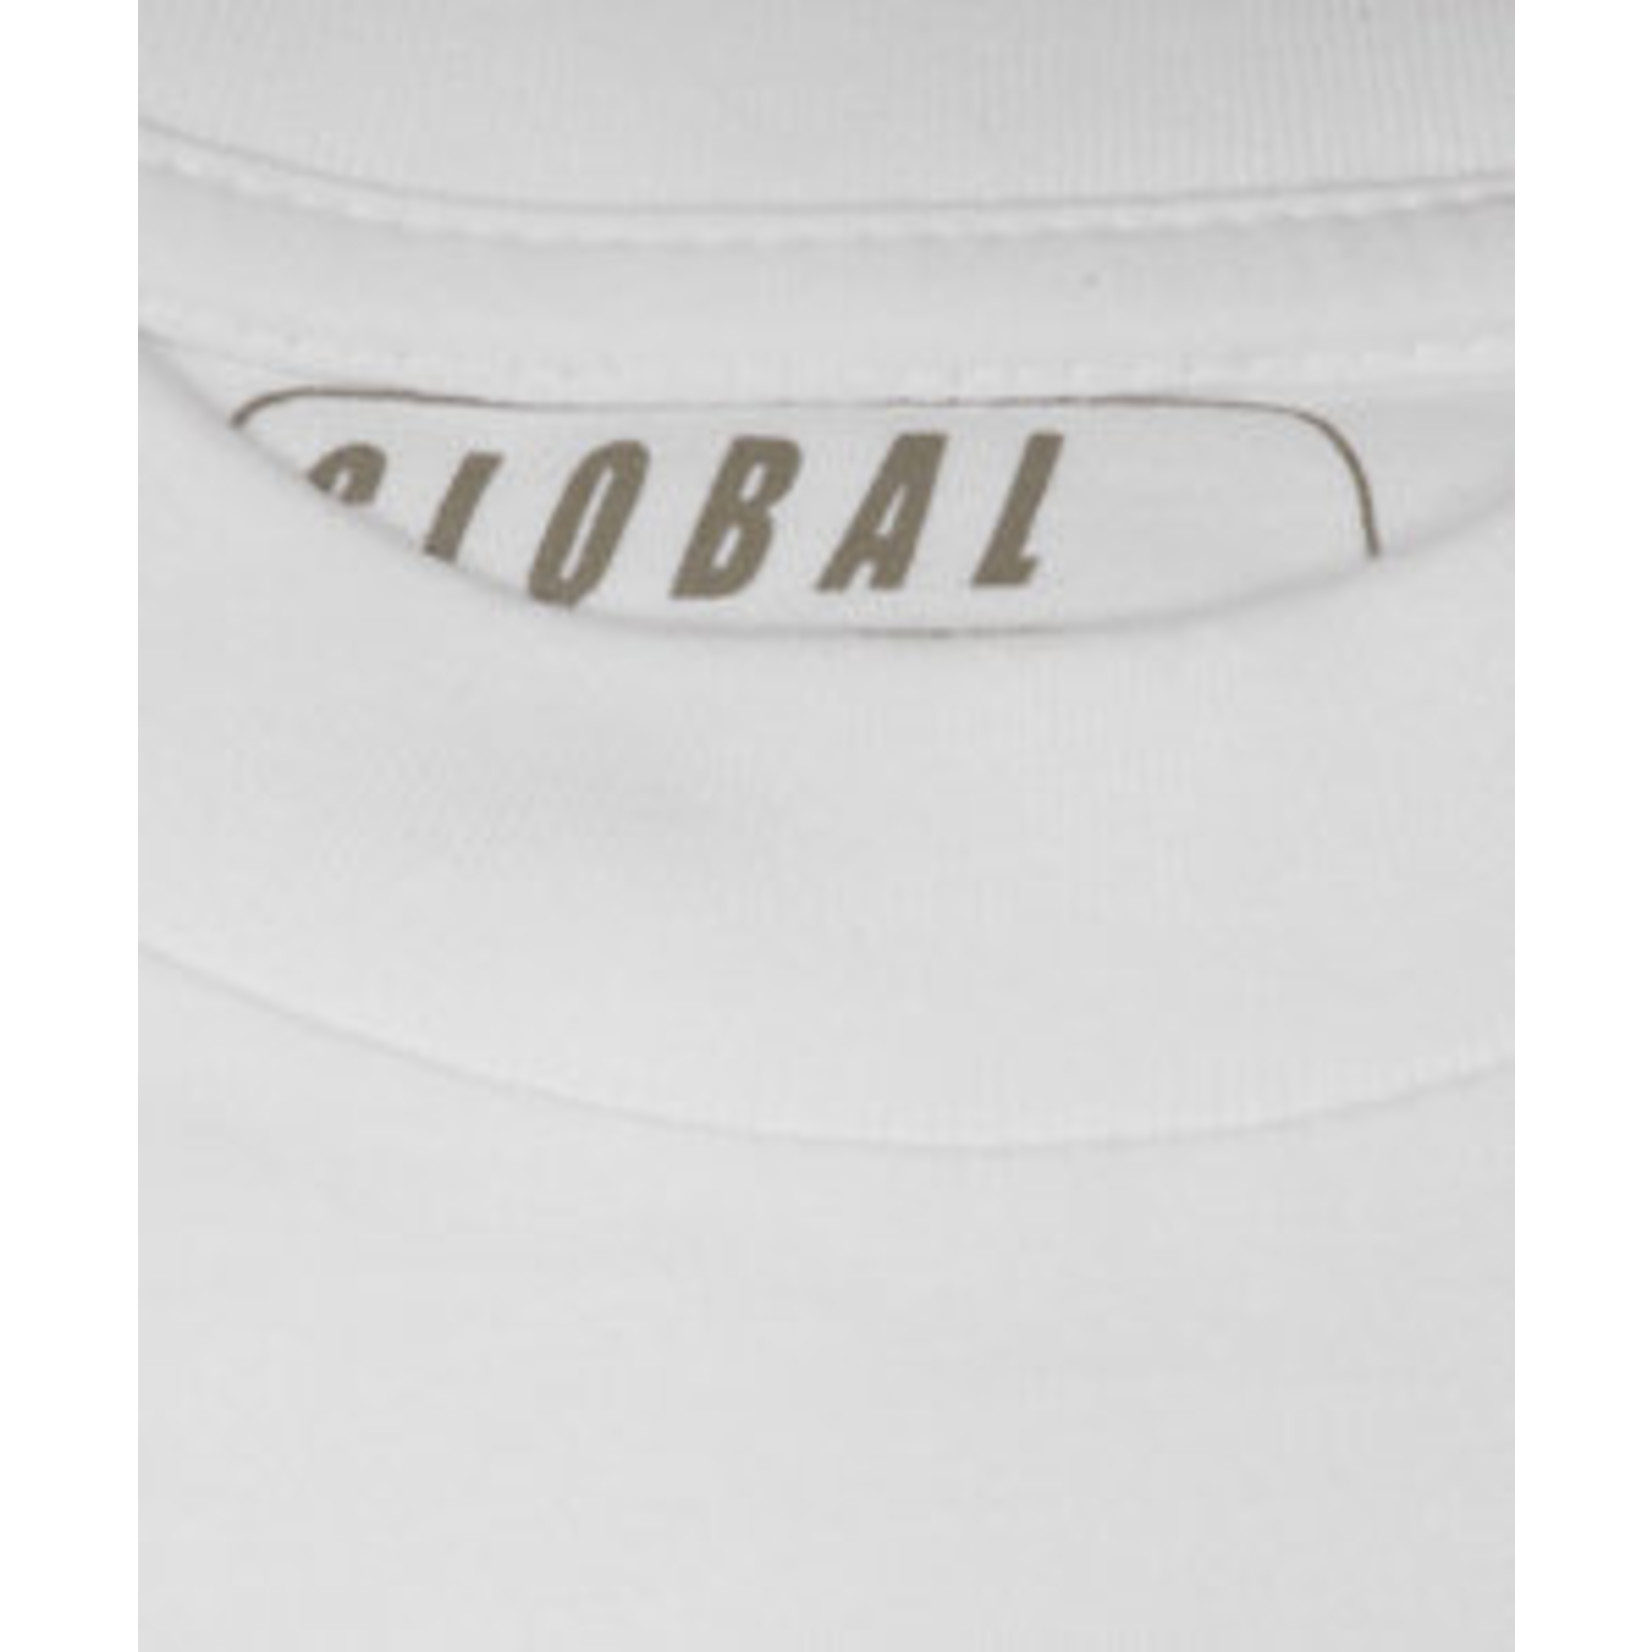 Global5 model Max 2-pack ronde hals t-shirt wit